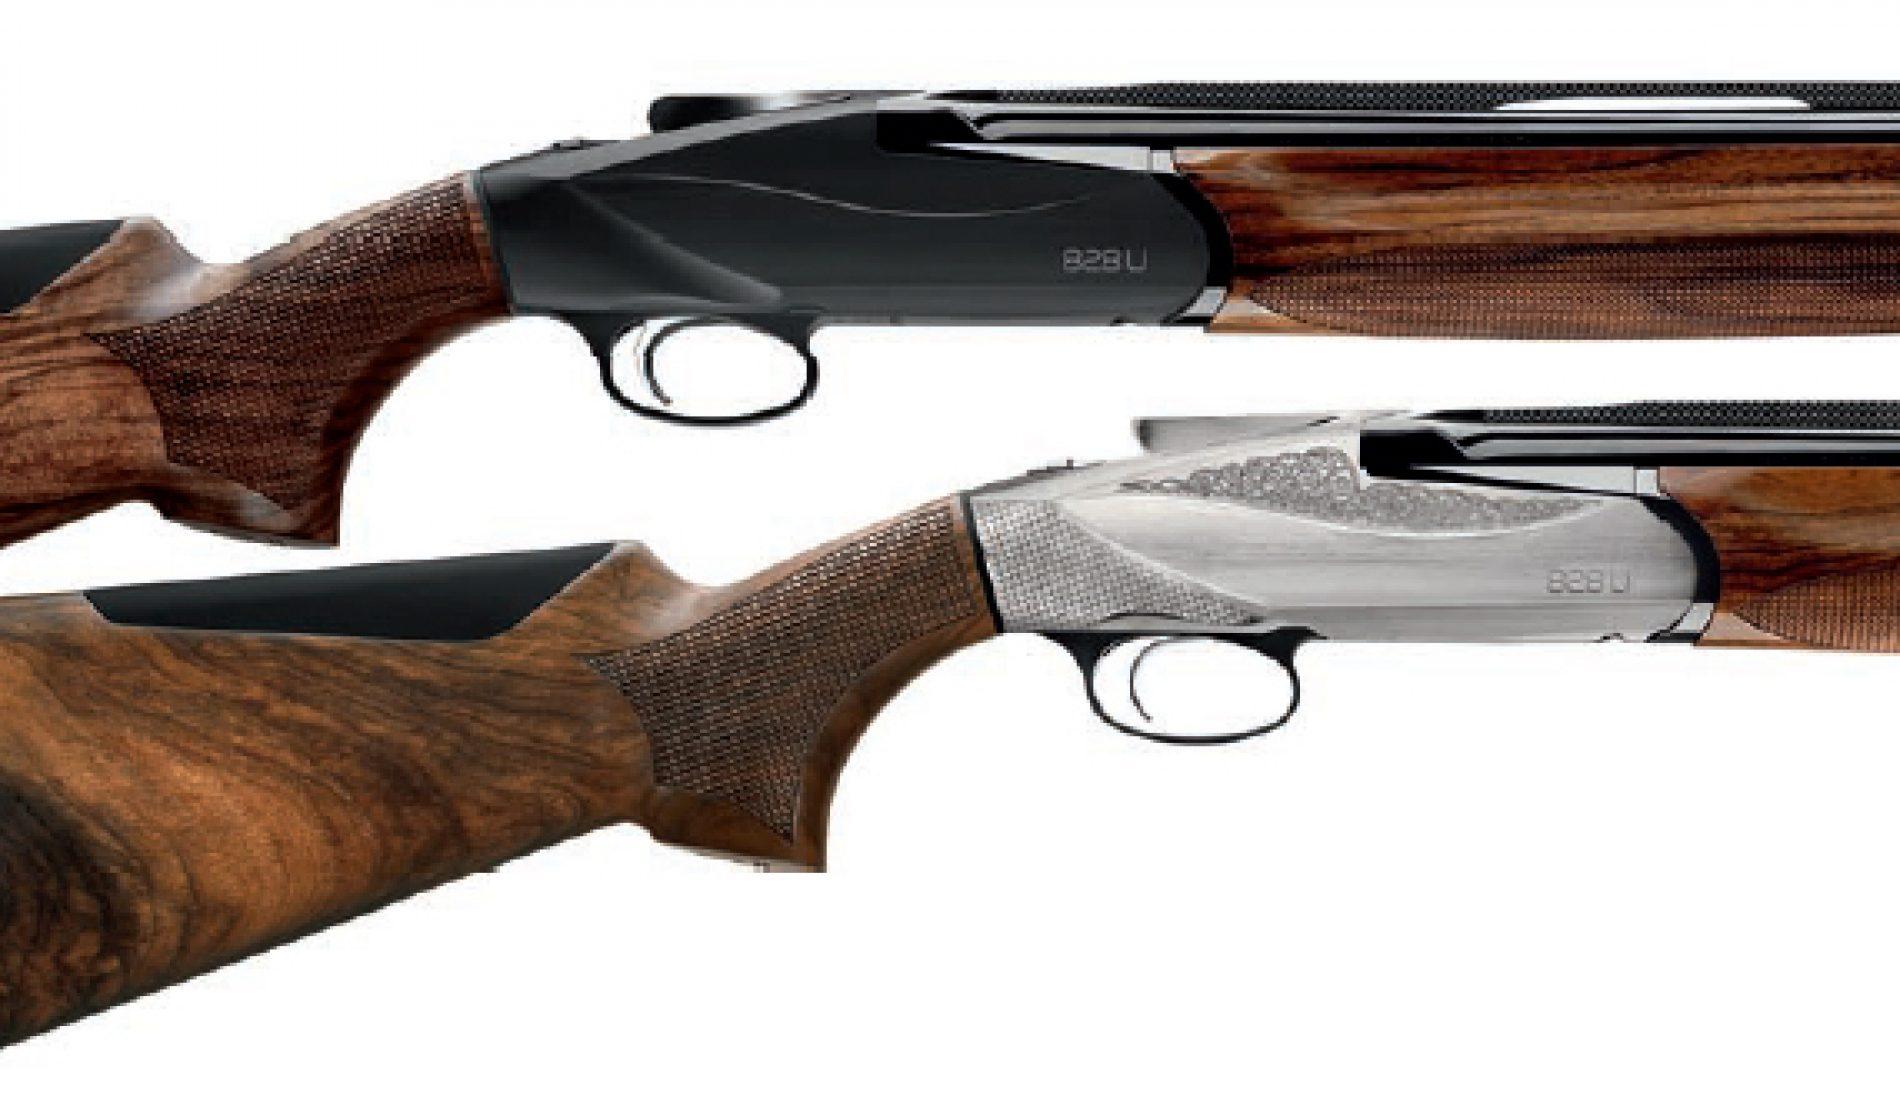 Prueba de la escopeta superpuesta Benelli 828 U